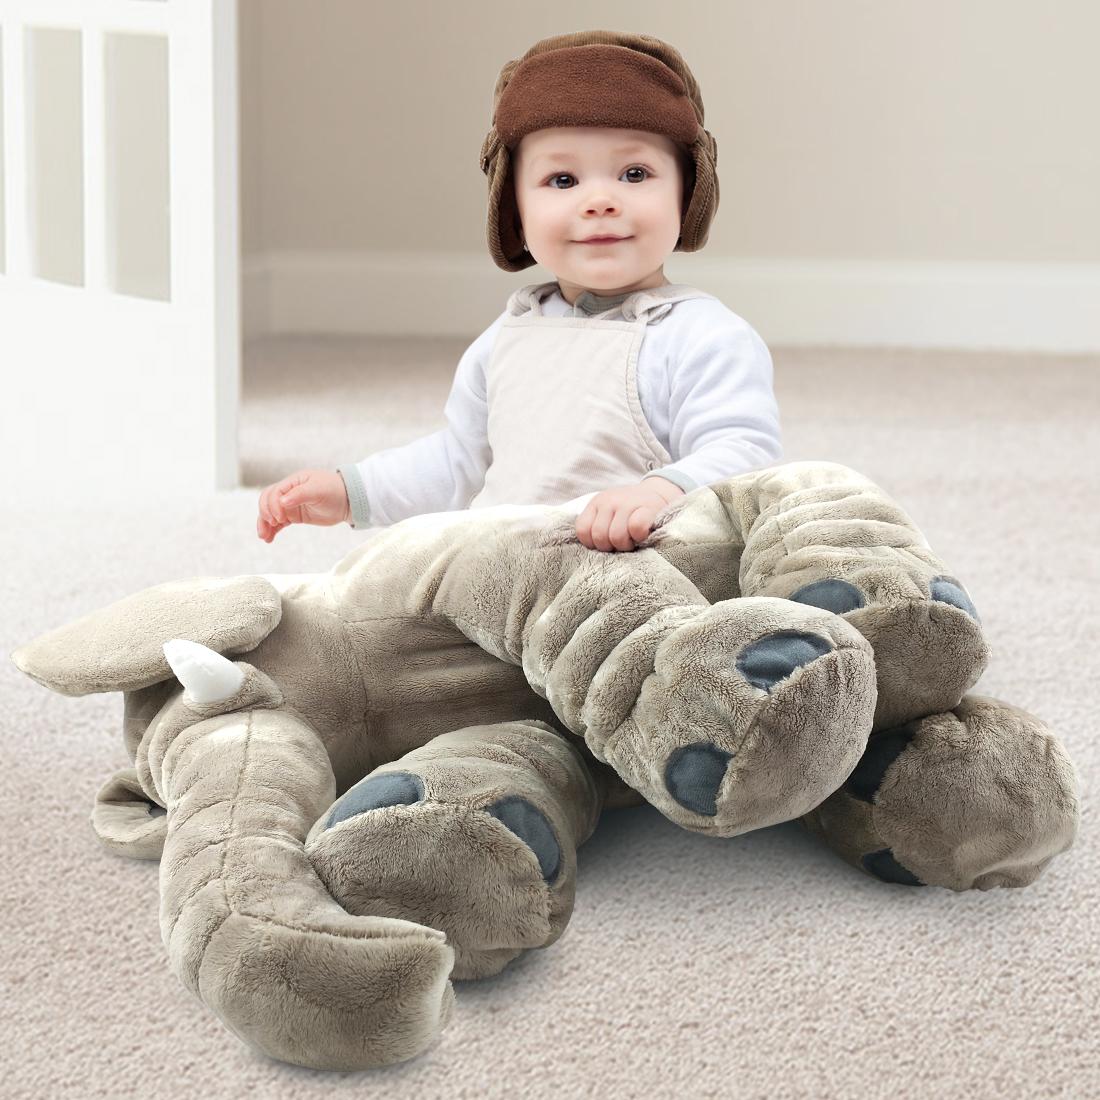 Giant 24 Quot Stuffed Elephant Cute Soft Plush Cuddly Fluffy